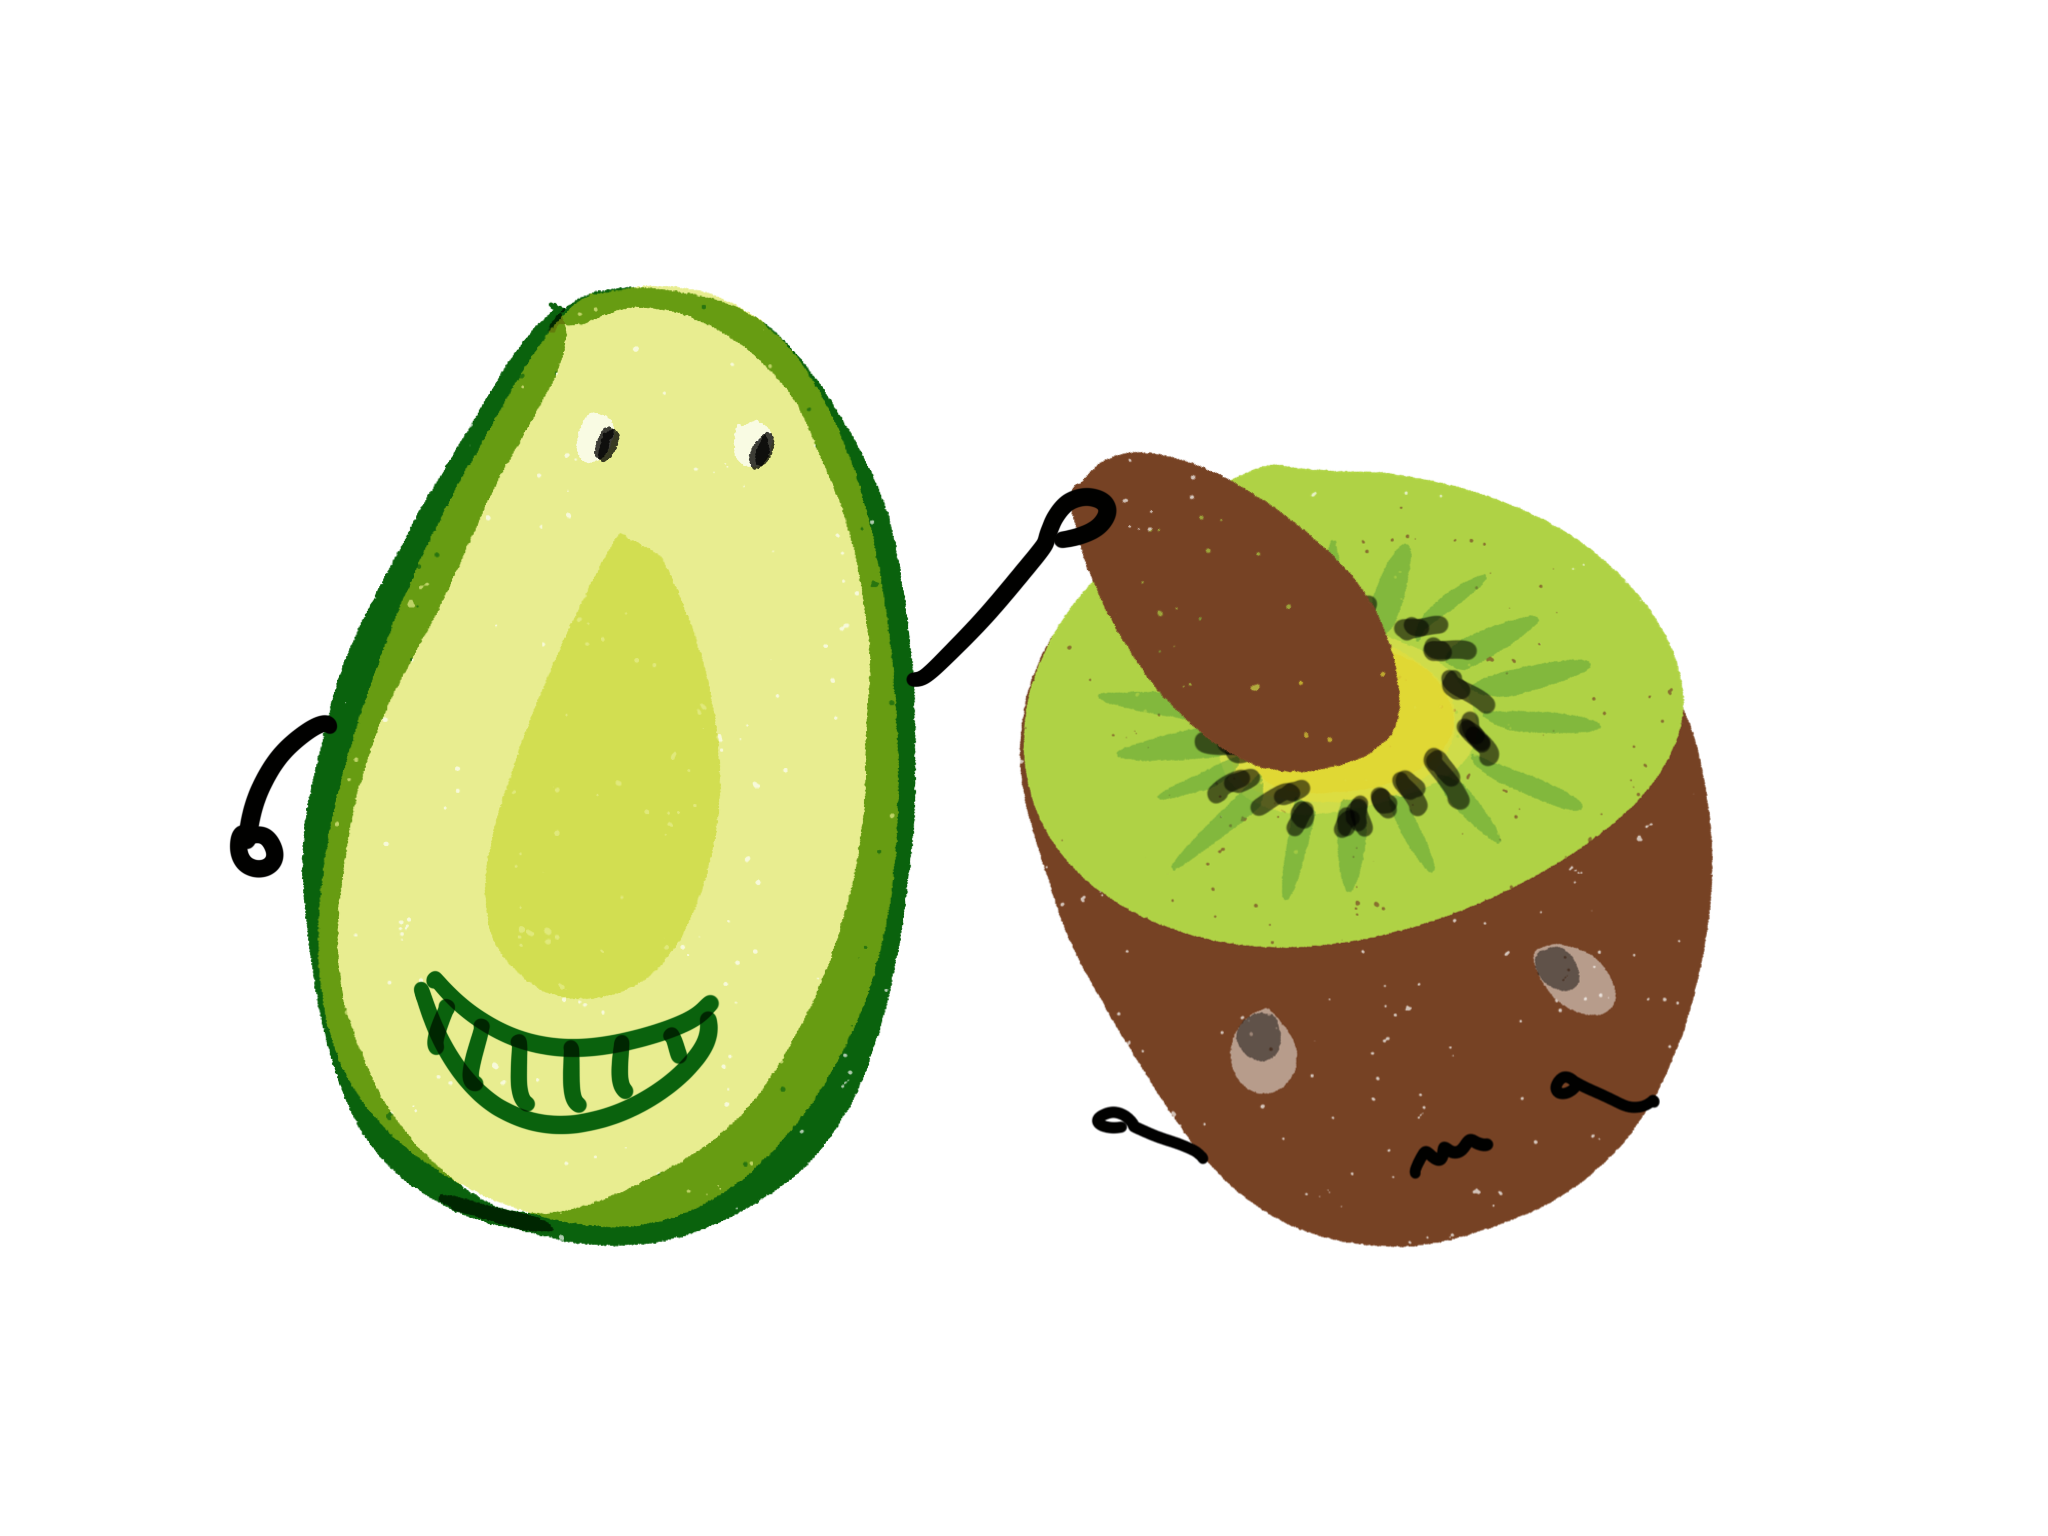 Avocado and Kiwi